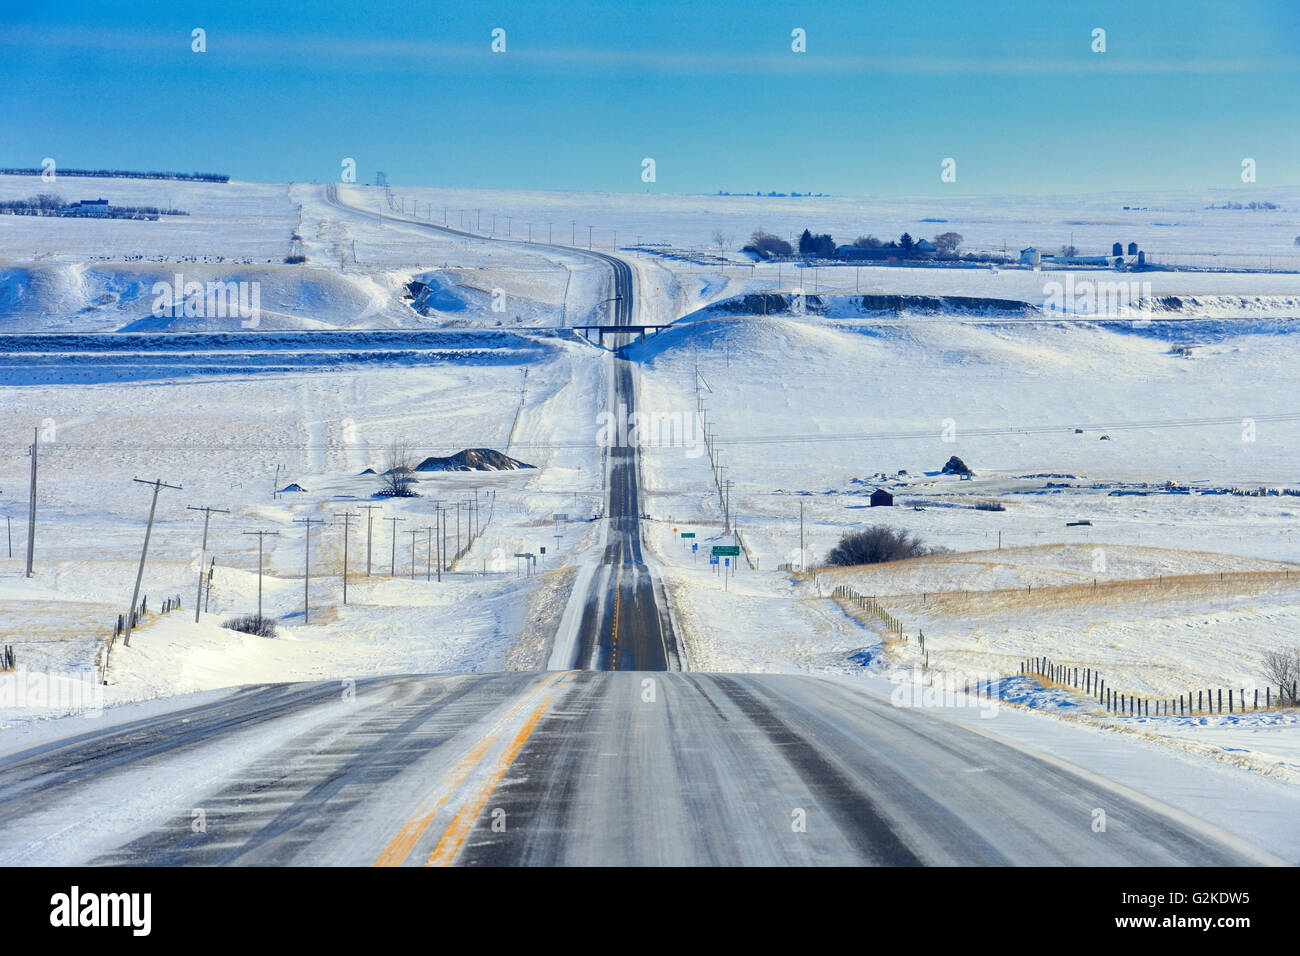 Wintery conditions on Highway 13 Verwood Saskatchewan Canada - Stock Image